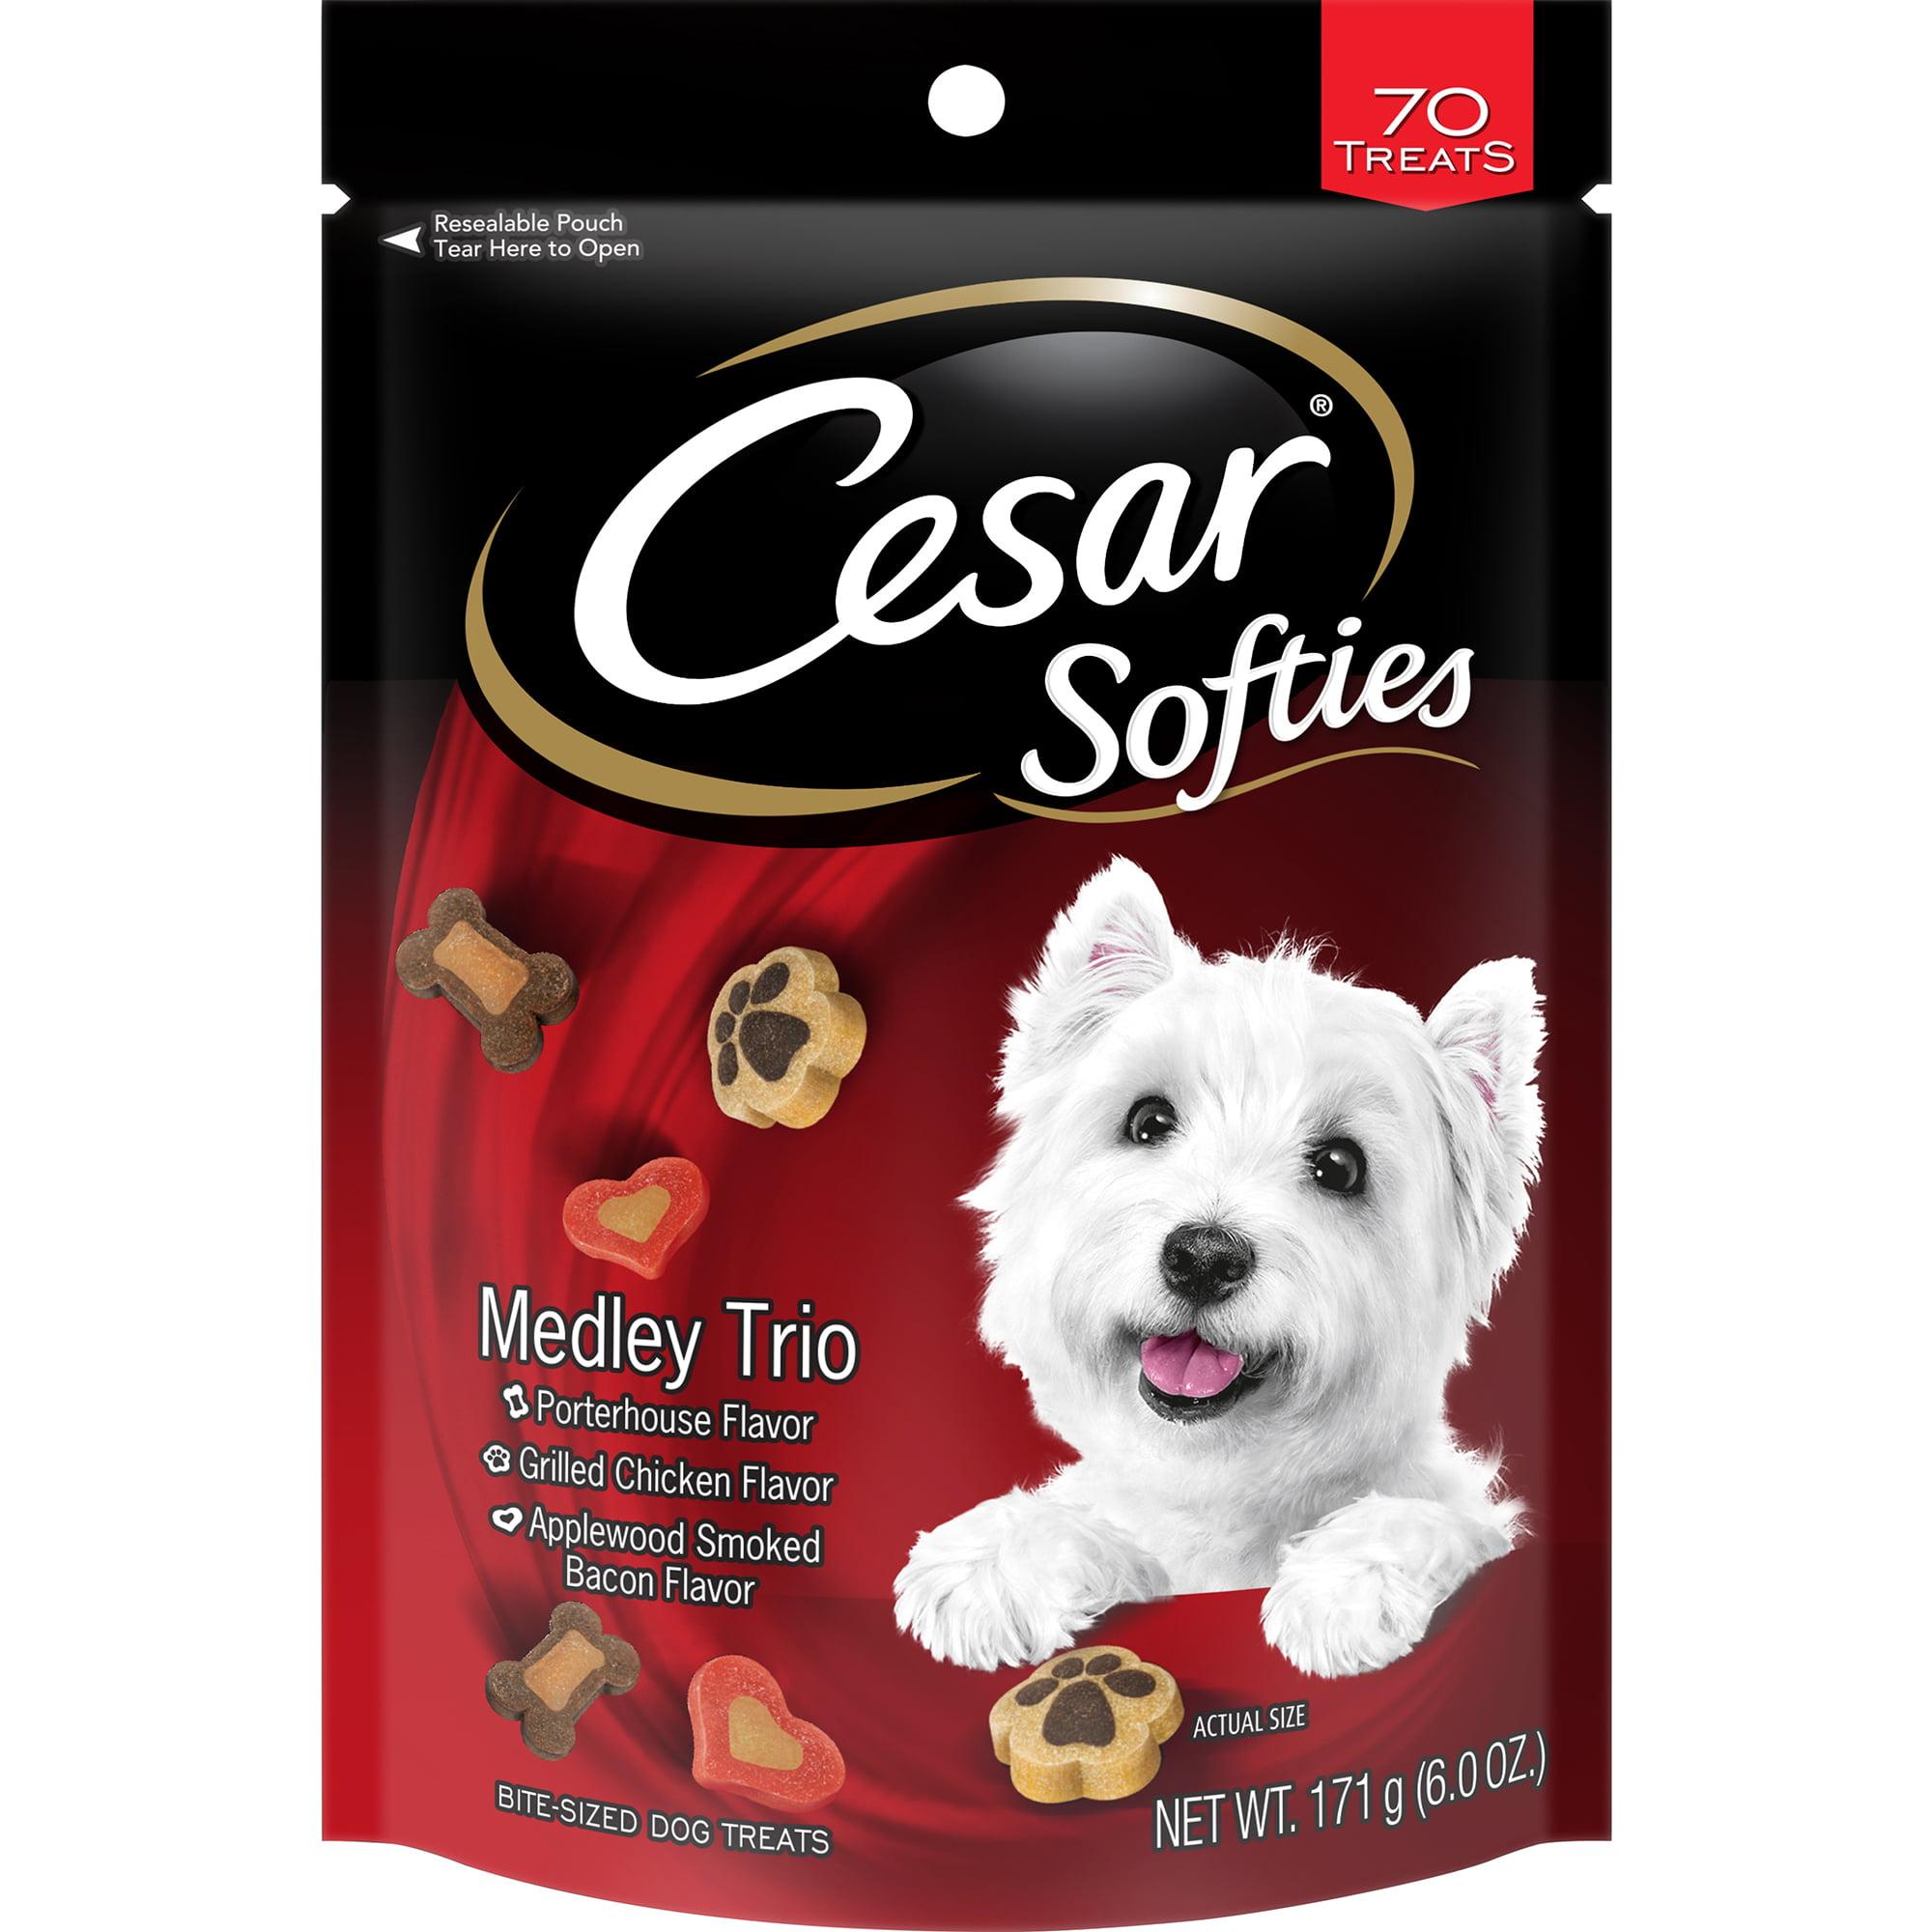 CESAR SOFTIES™ Medley Trio Dog Treats - 6 oz. 70 Treats